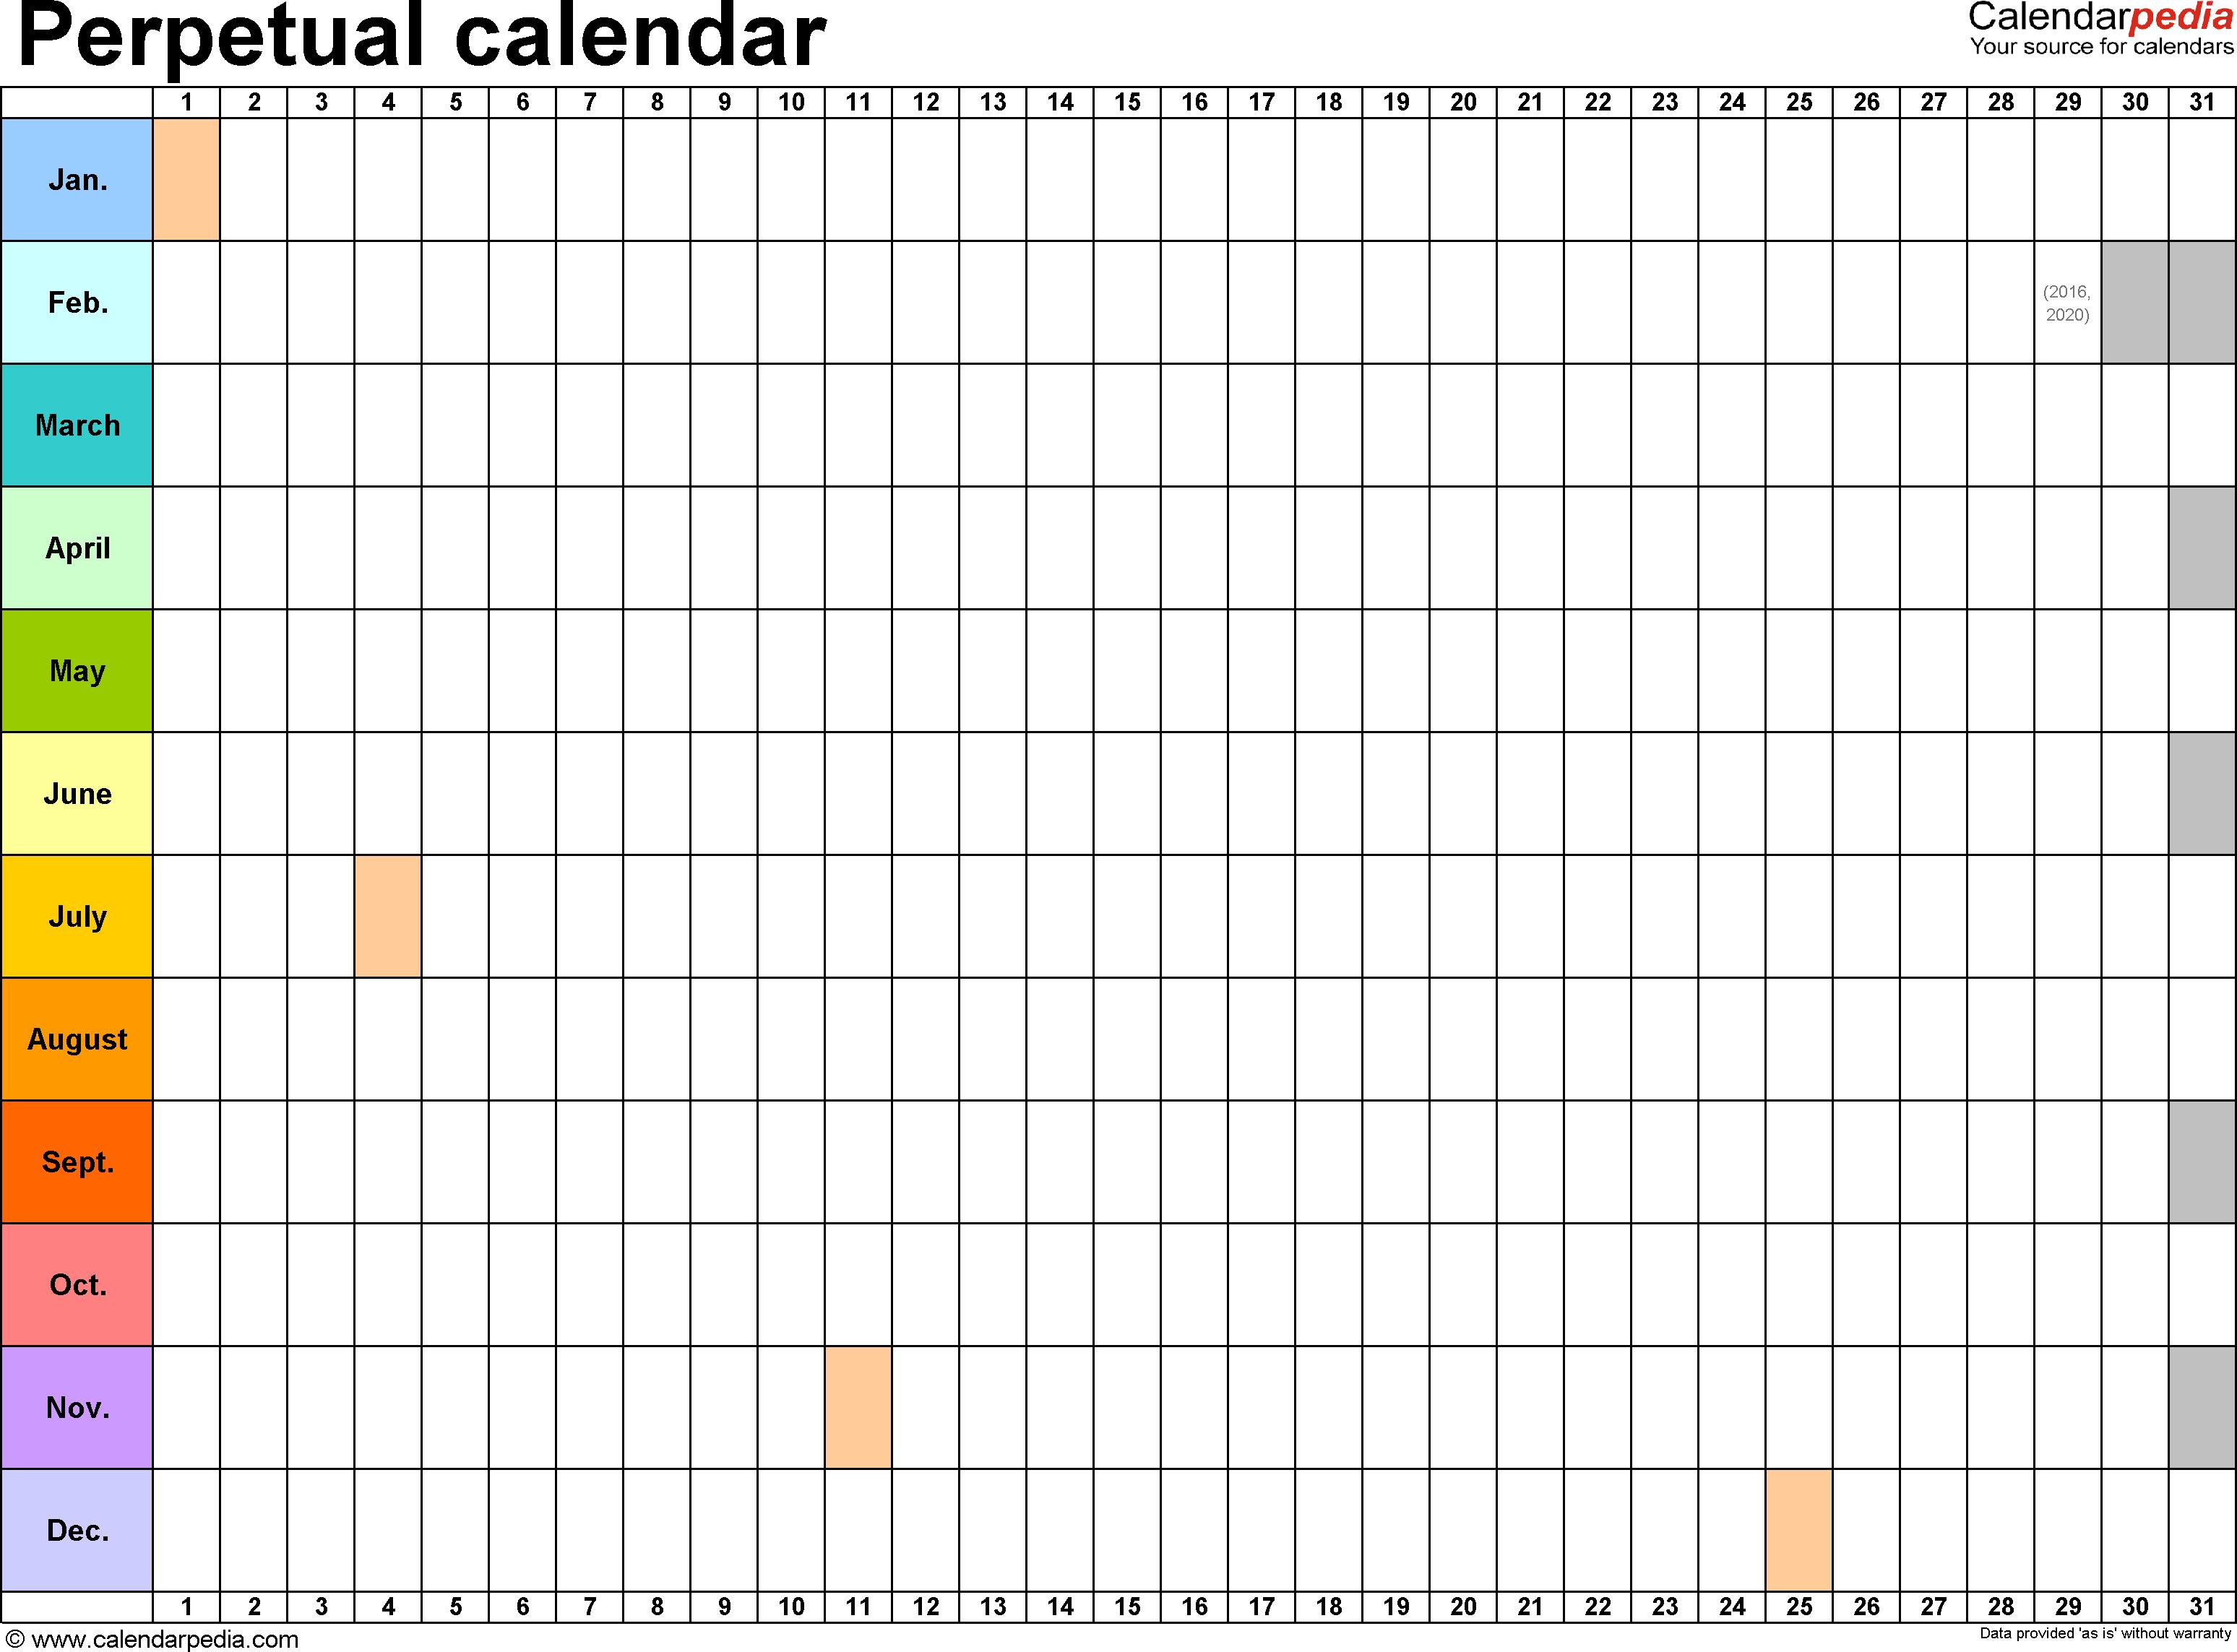 image about Perpetual Calendar Template identify Template 2: Excel template for perpetual calendar (landscape